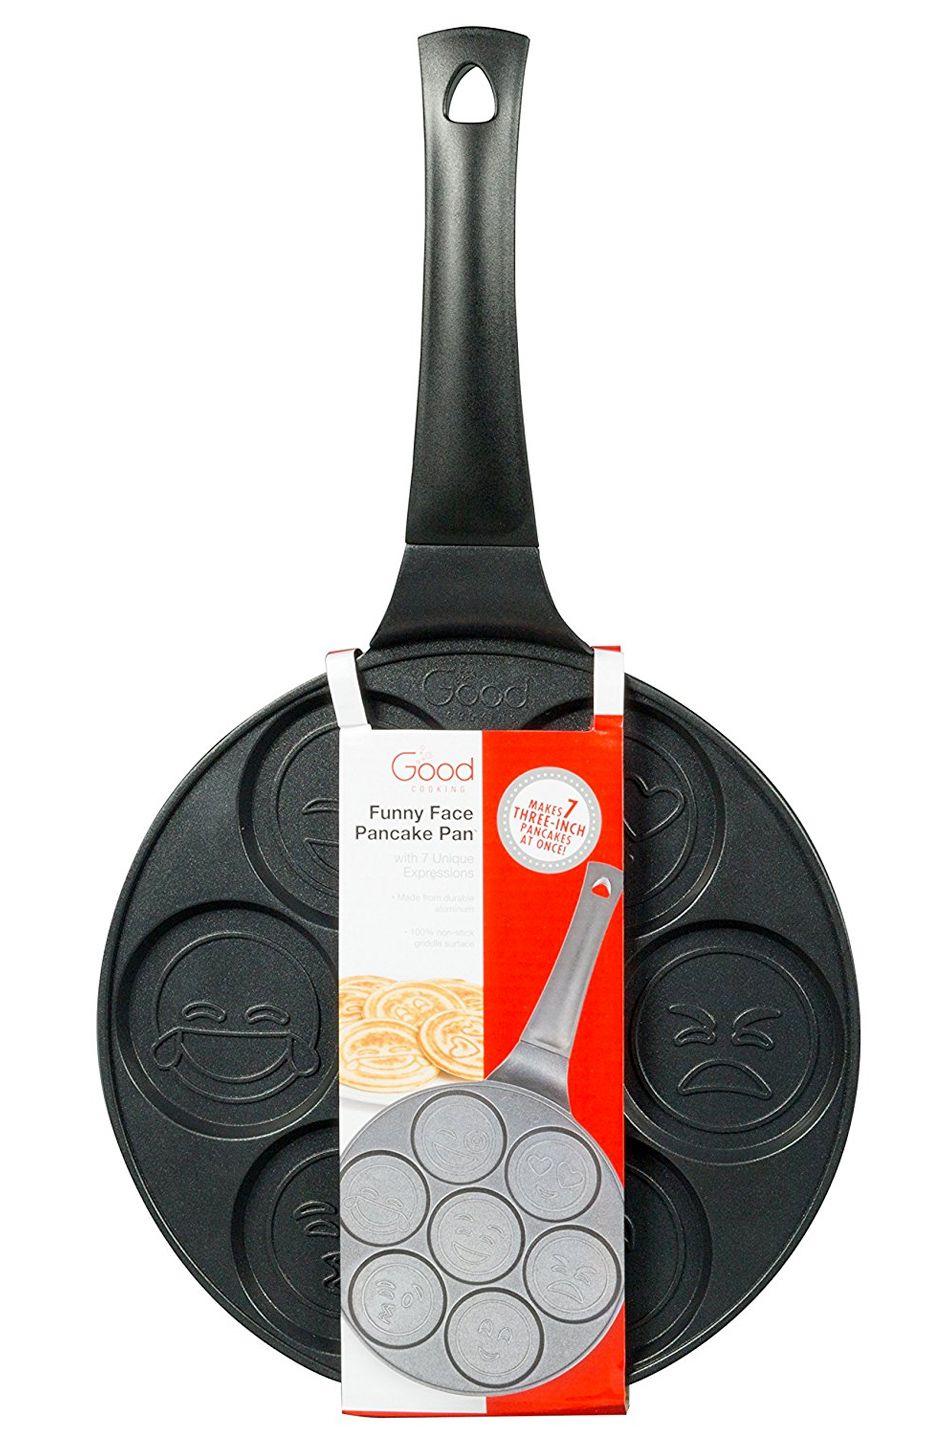 Frigideira-de-Panquecas-Emoji-Smiley-Face-Pancake-Pan-03